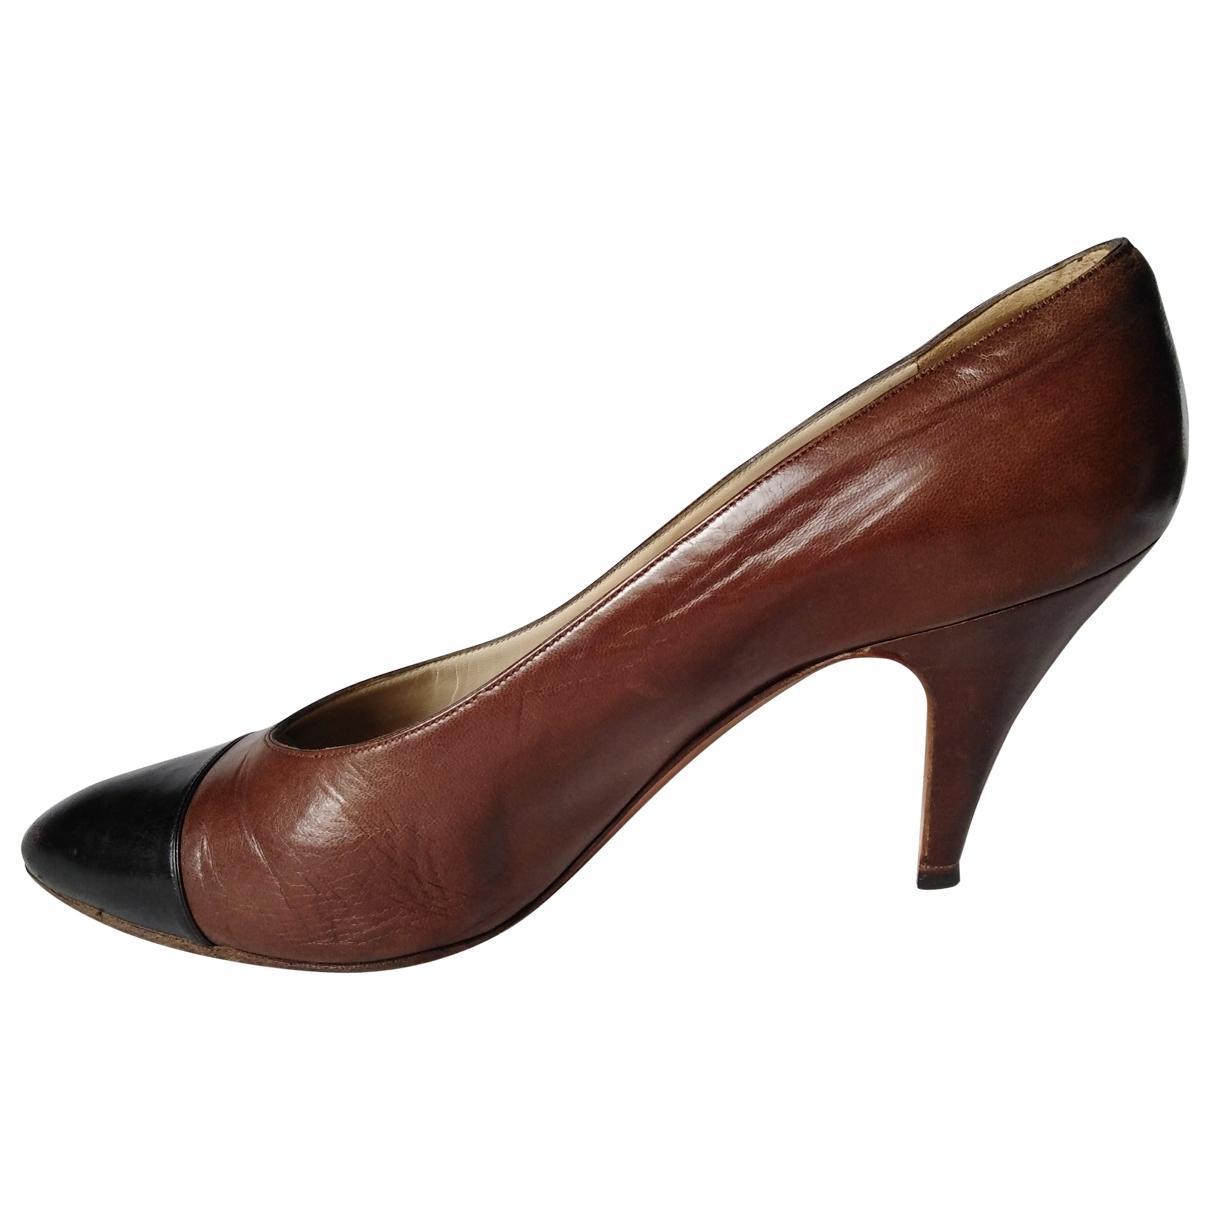 Chanel \N Brown Leather Heels for Women 38.5 EU